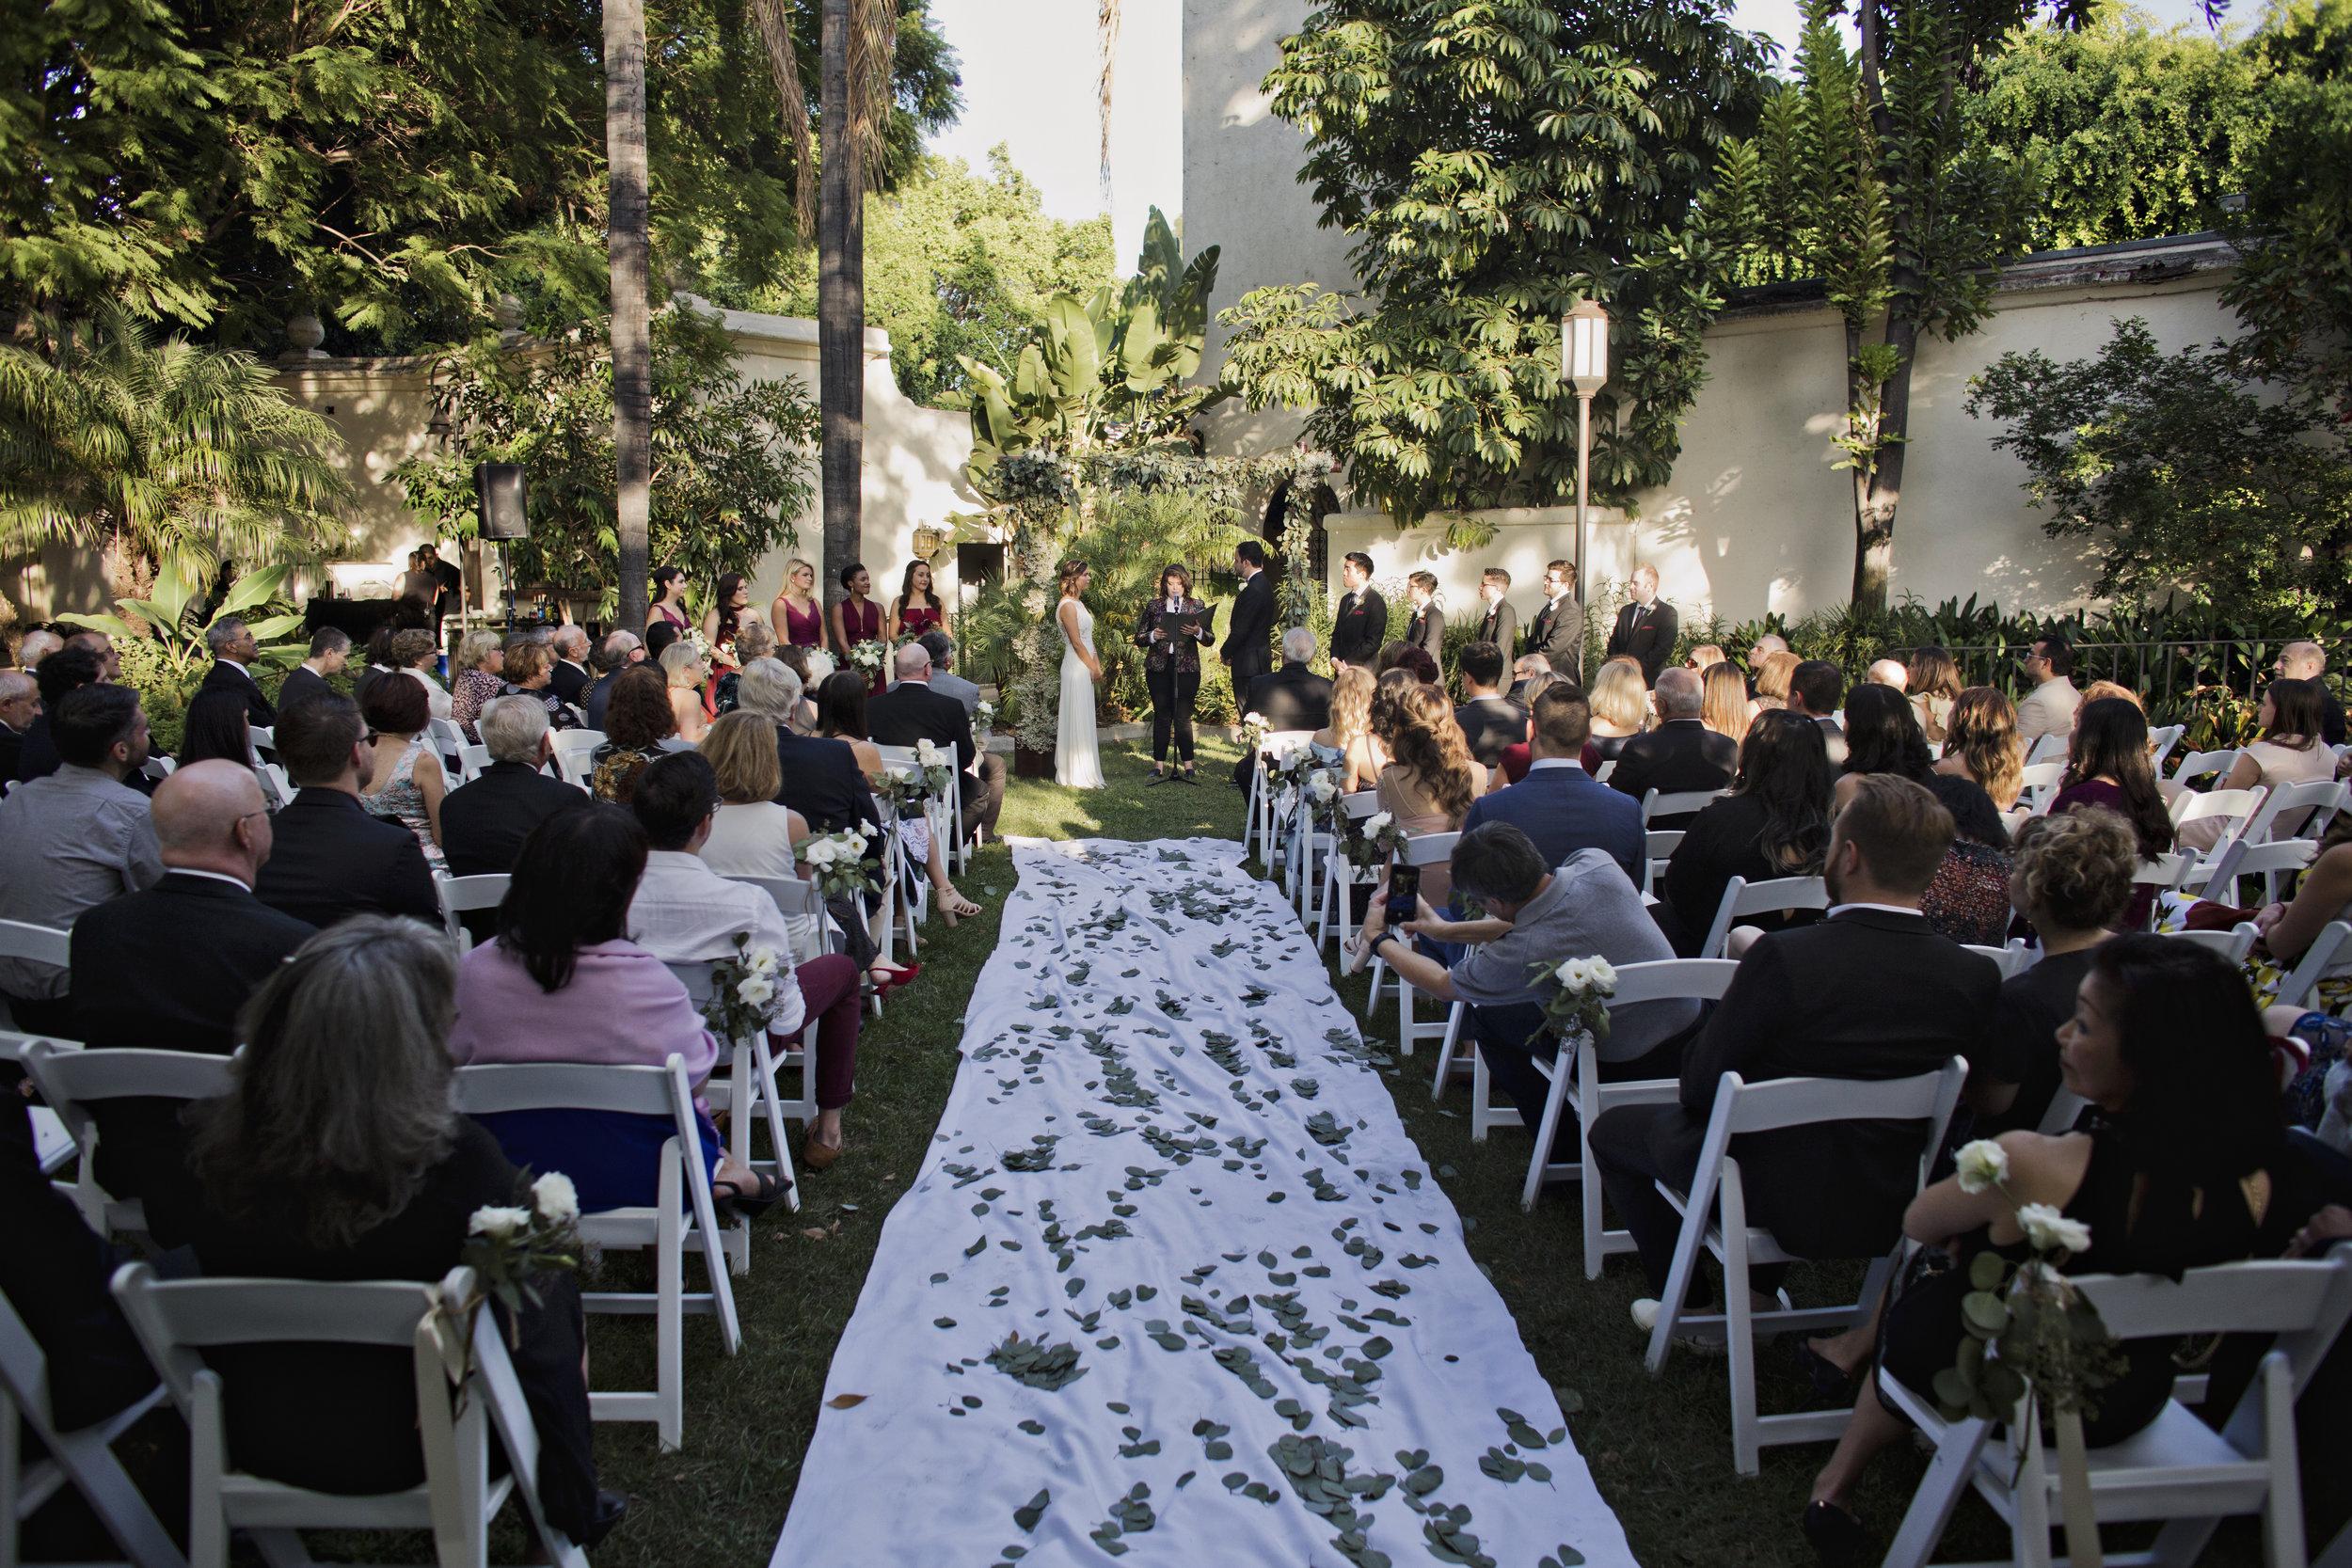 laura_alec_wedding_09302017_0417.jpg